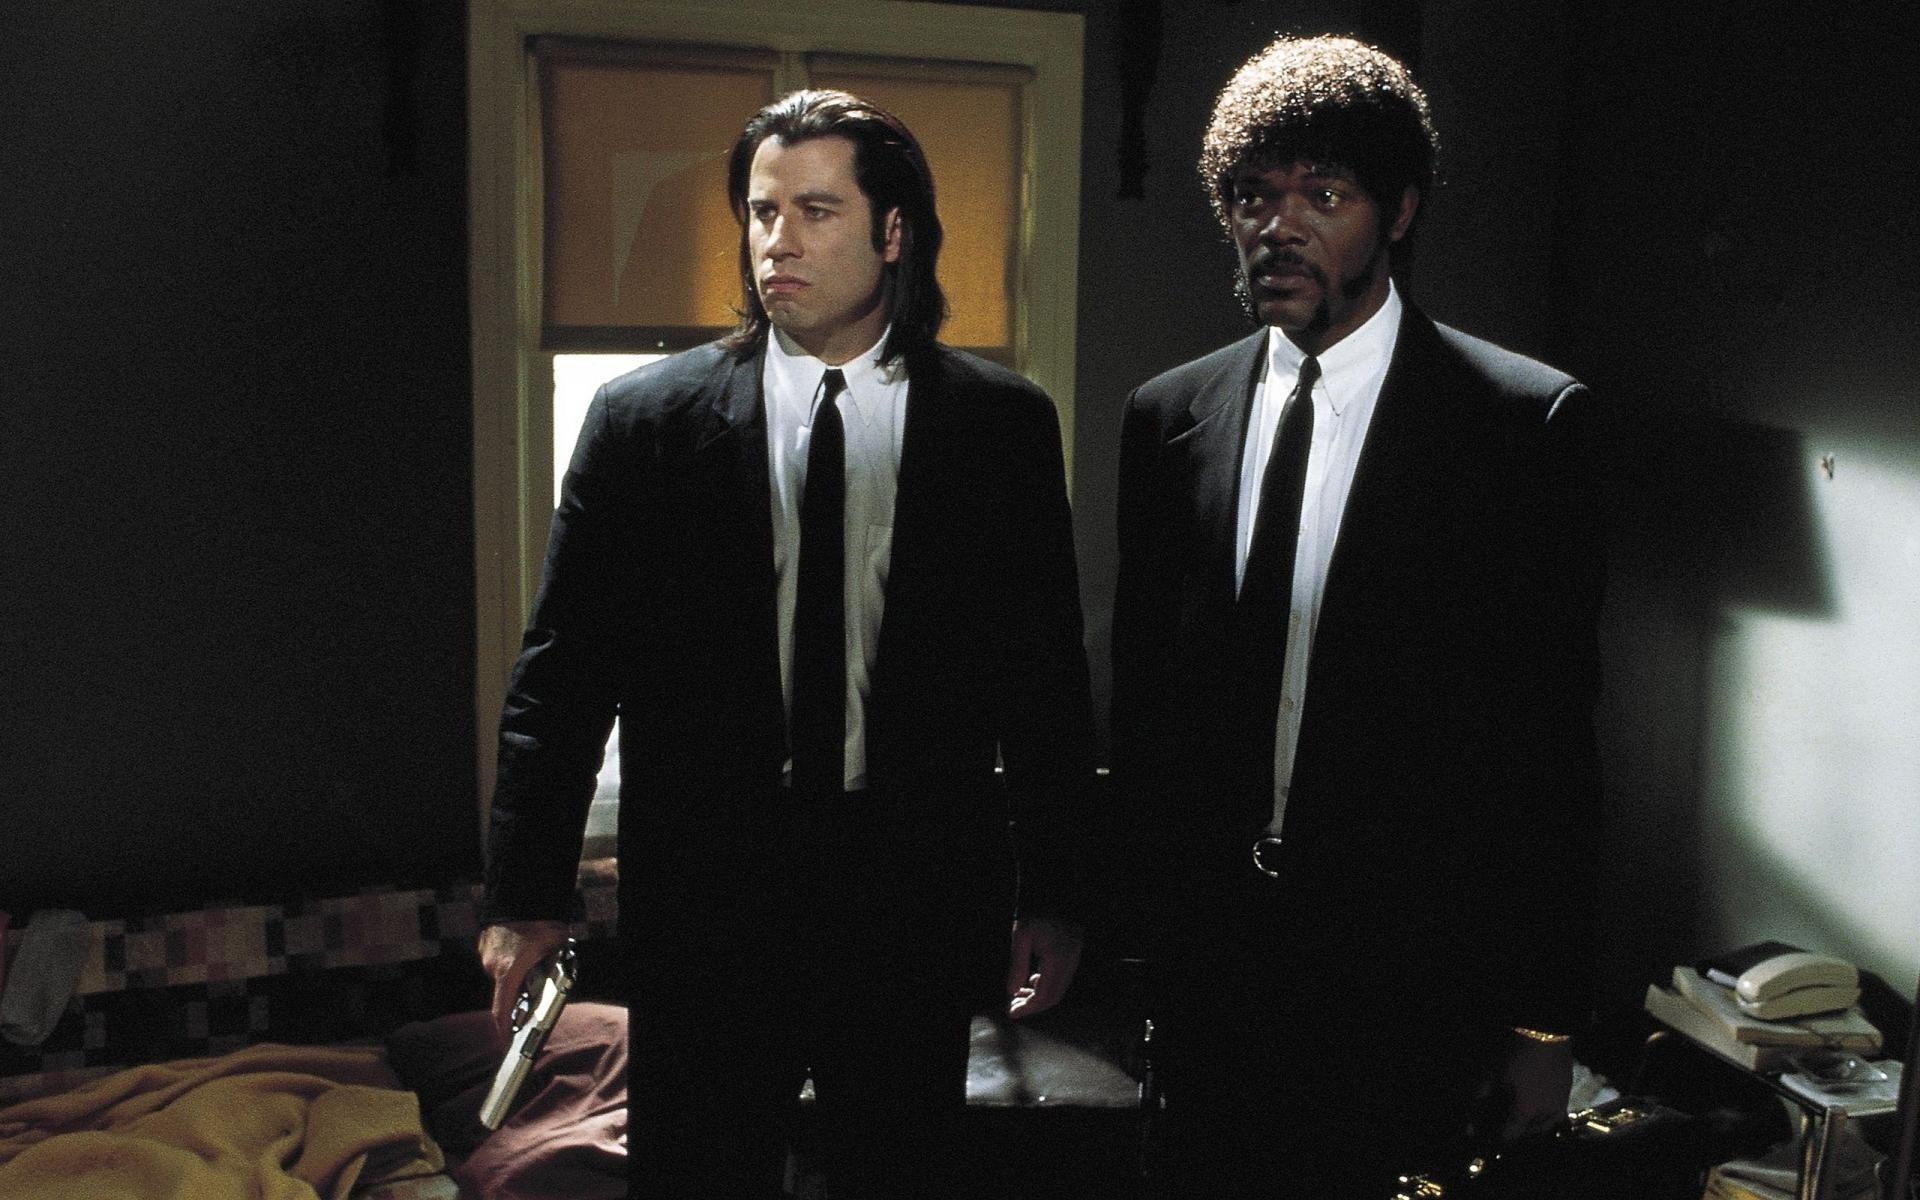 Kriminalnoe Chtivo Rulp Fiction Dzhon Travolta John Travolta Semyuel L Dzhekson Samuel L Jackson Pulp Fiction Nicolas Cage Movies